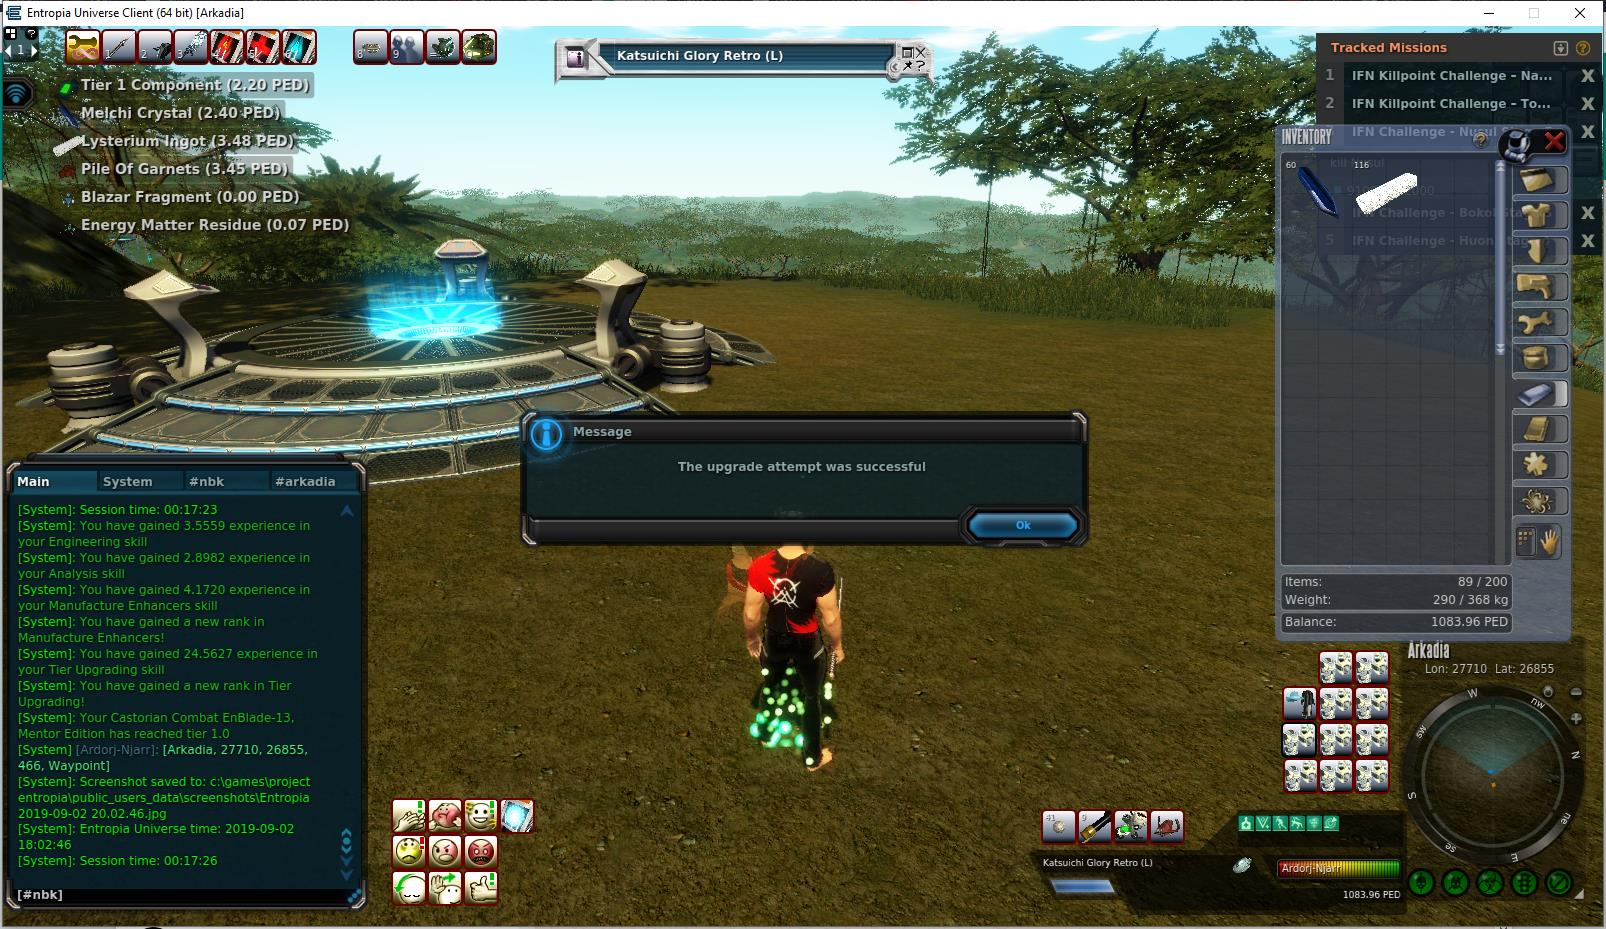 Tier 1-B Castorian Combat EnBlade-13 Mentor Edition.jpg